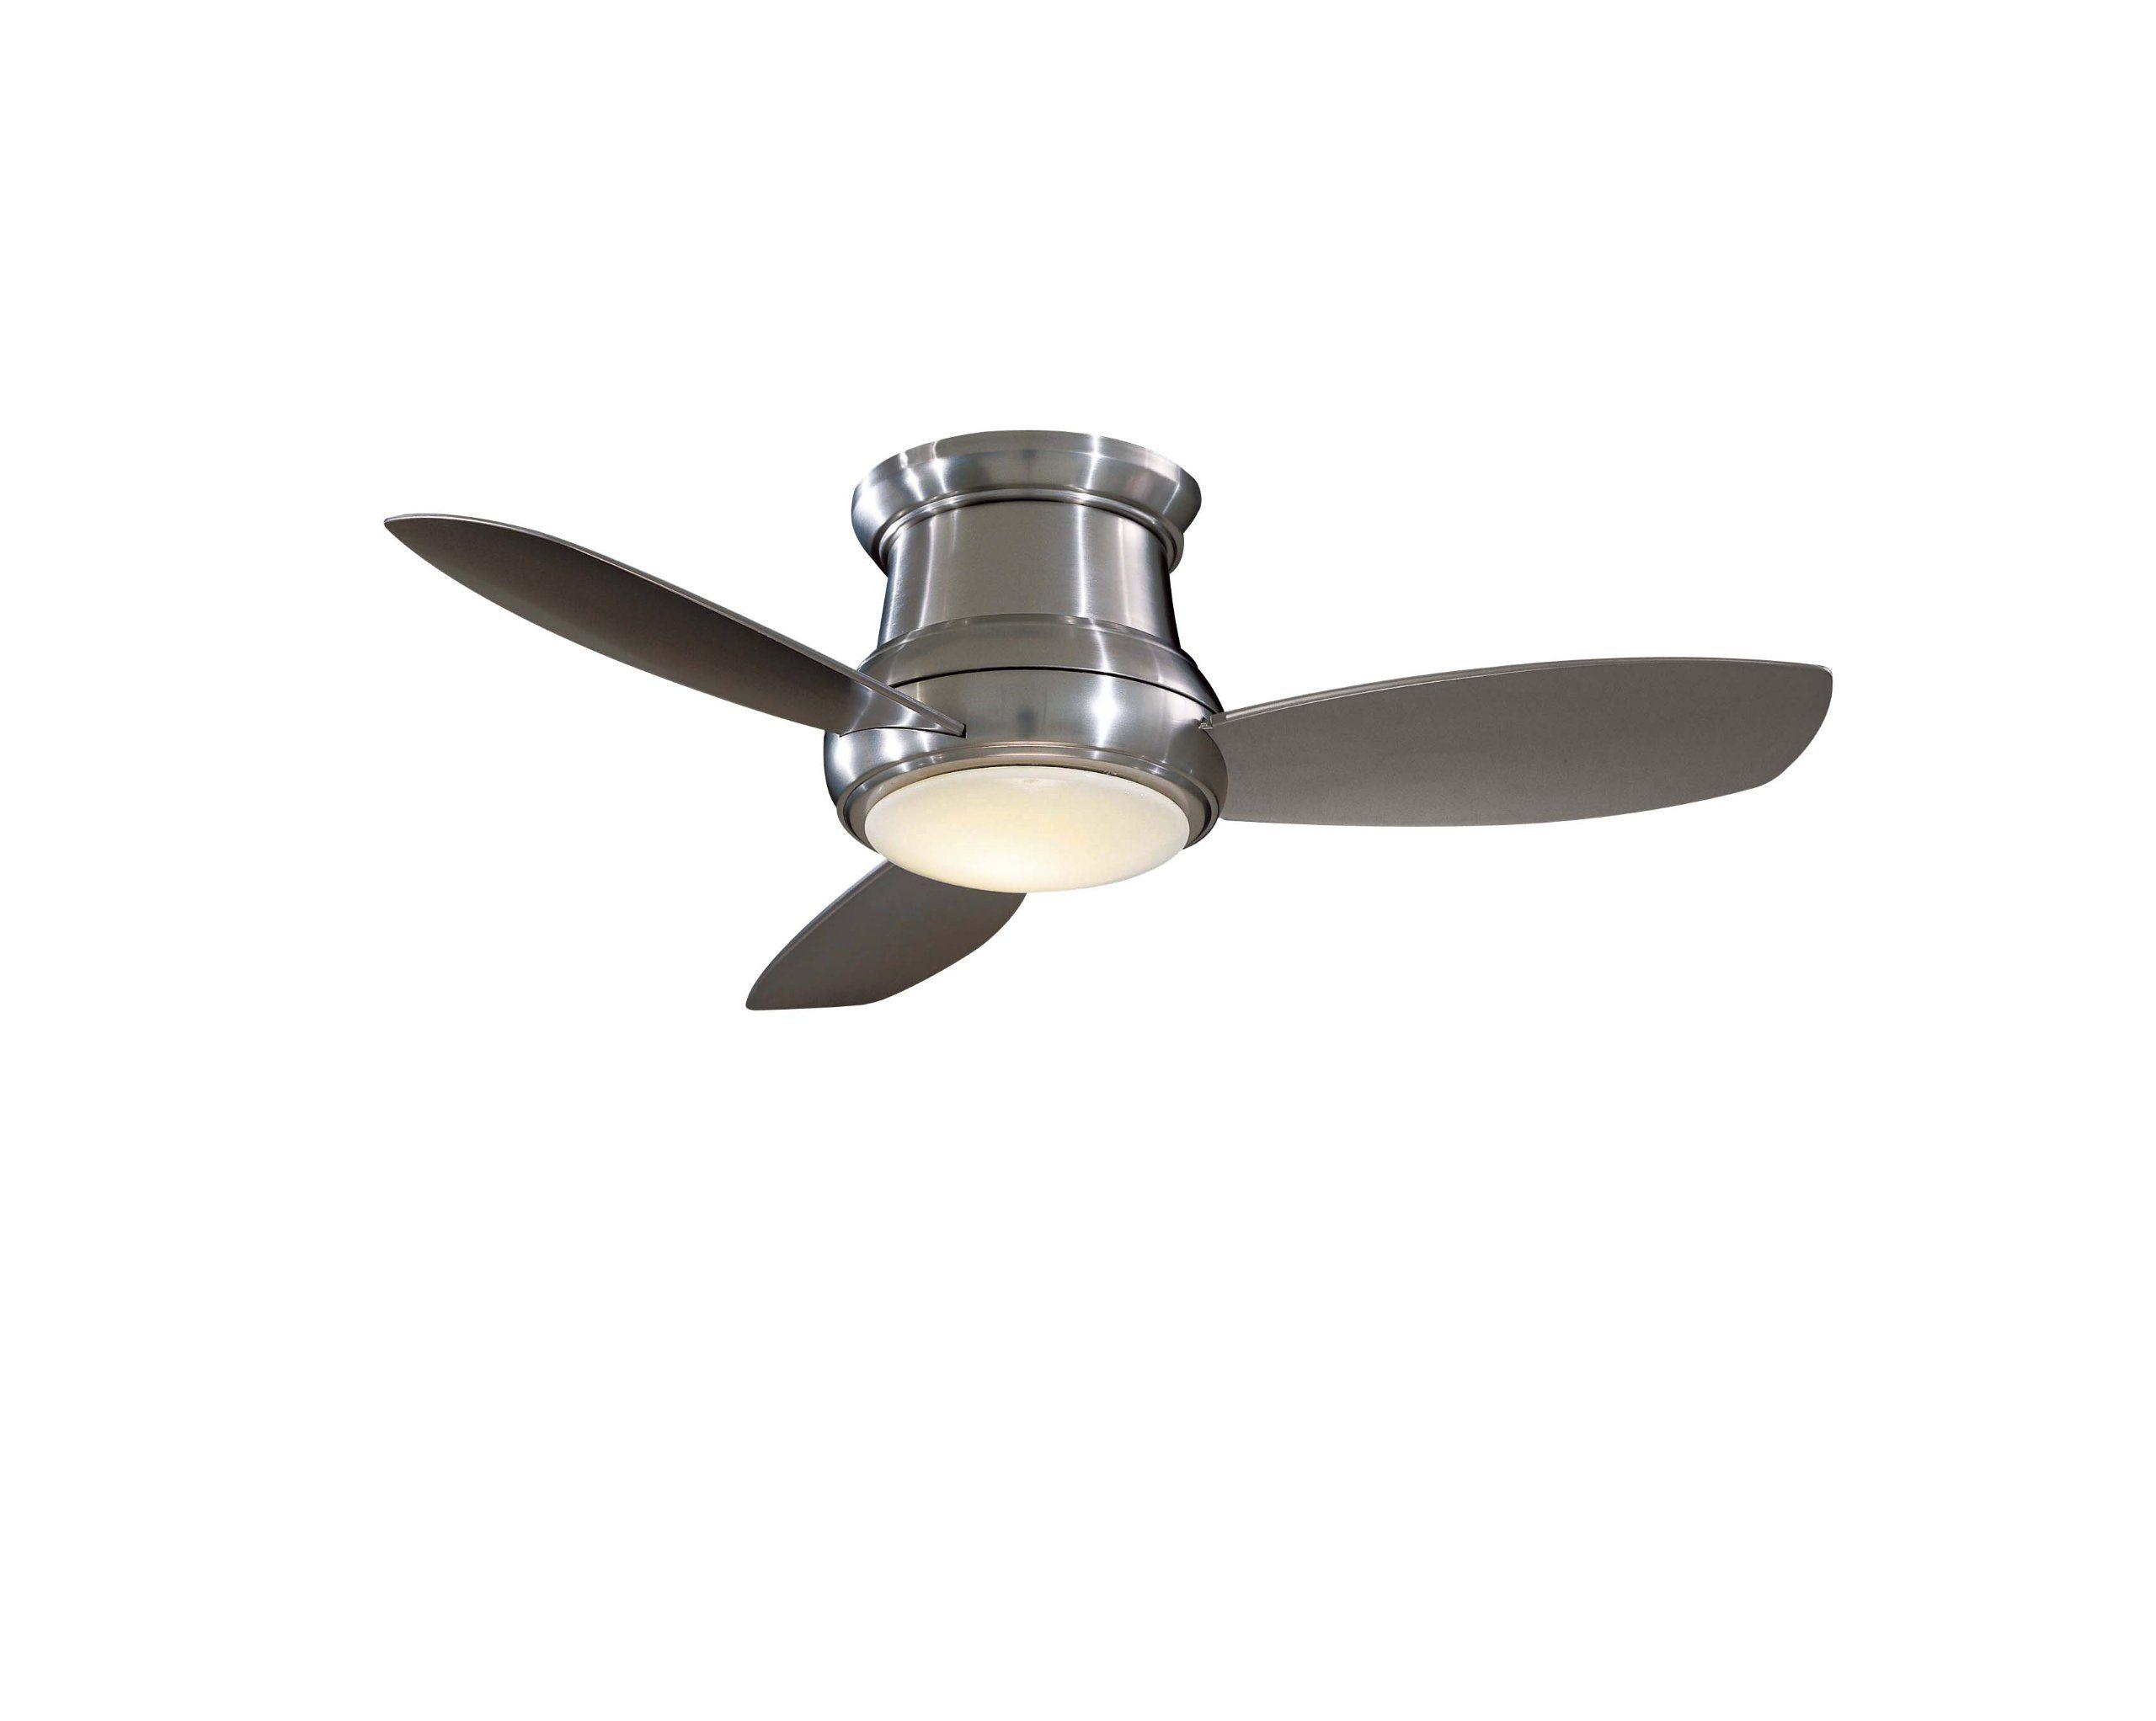 Minka Aire F518 BN 44 inch Concept II Flush Mount Ceiling Fan